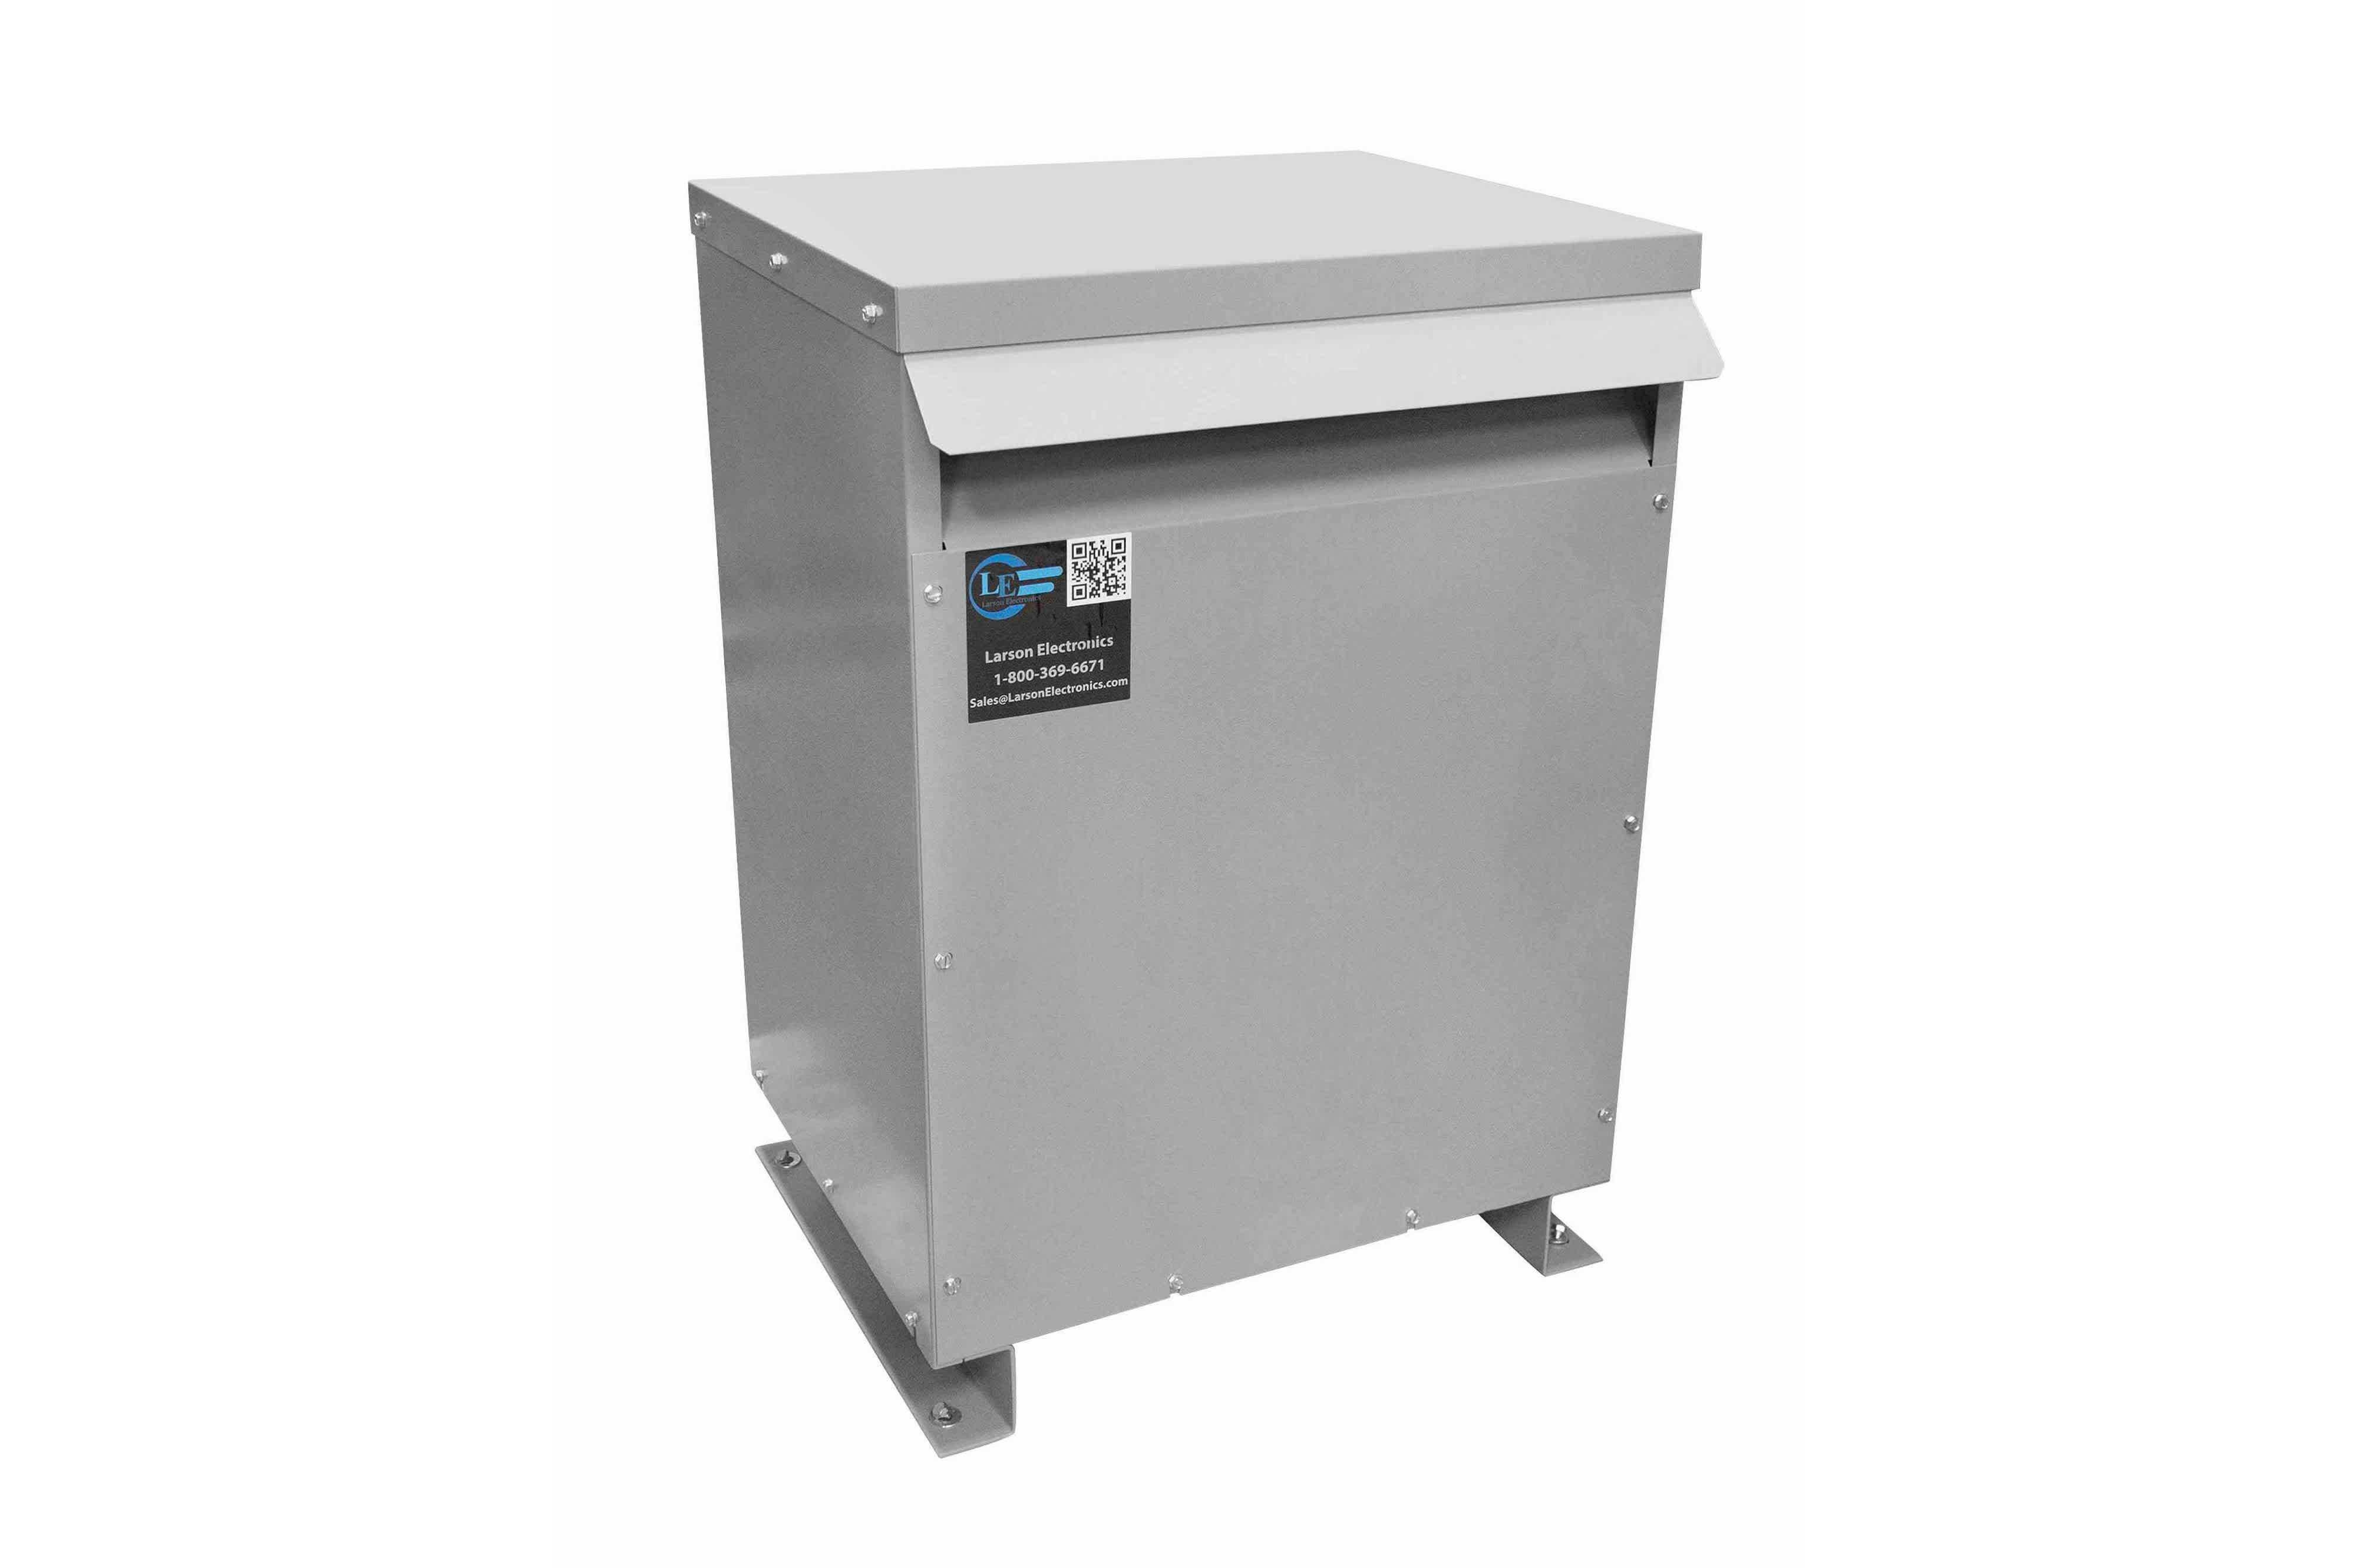 9 kVA 3PH Isolation Transformer, 230V Wye Primary, 208Y/120 Wye-N Secondary, N3R, Ventilated, 60 Hz